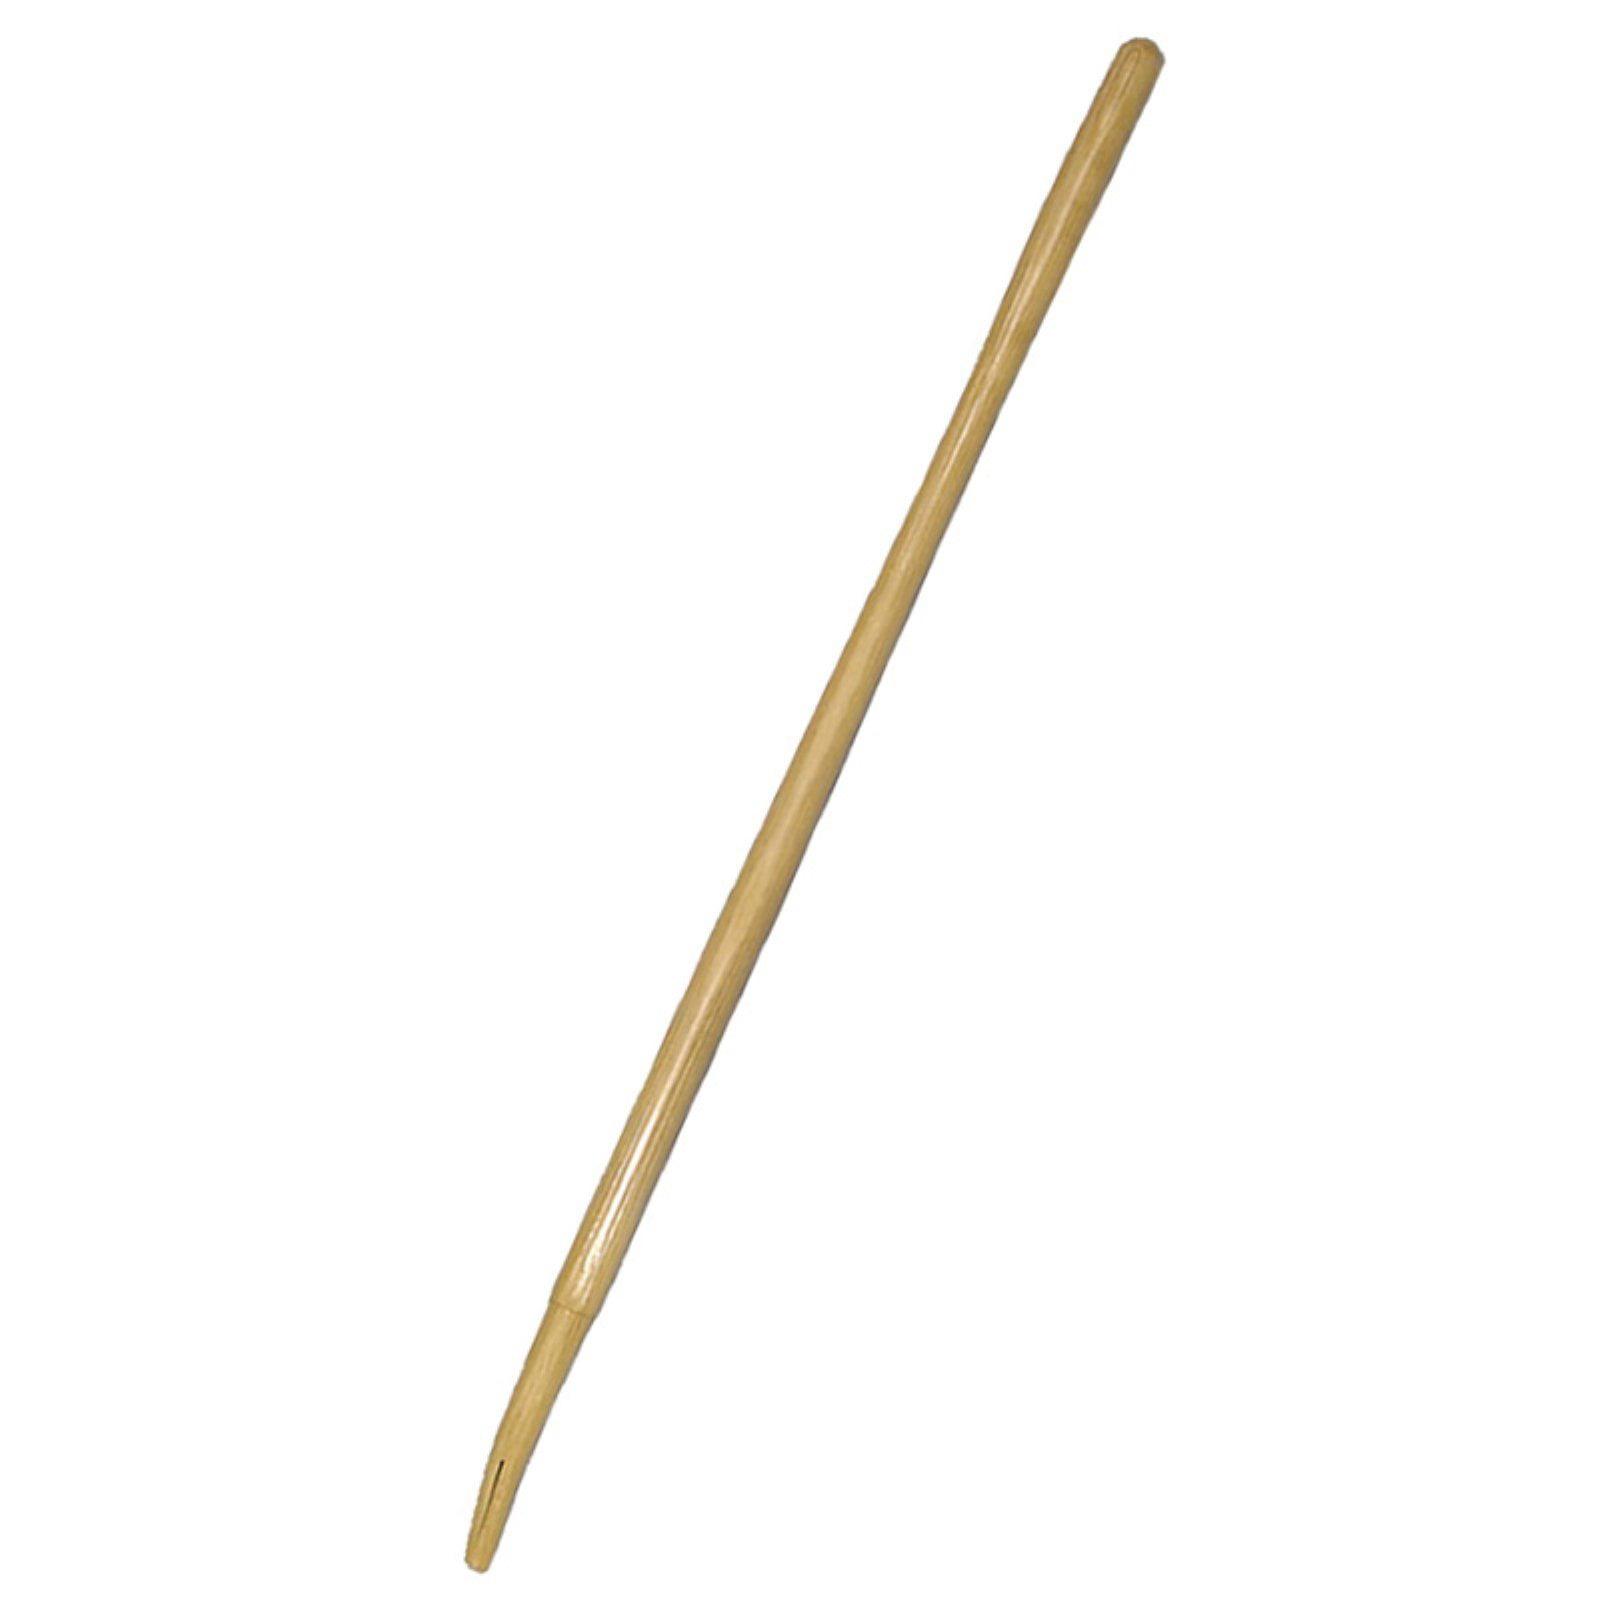 Seymour Link Handles 827-21 66705 48 in Long Bent Hollowback Shovel Handle